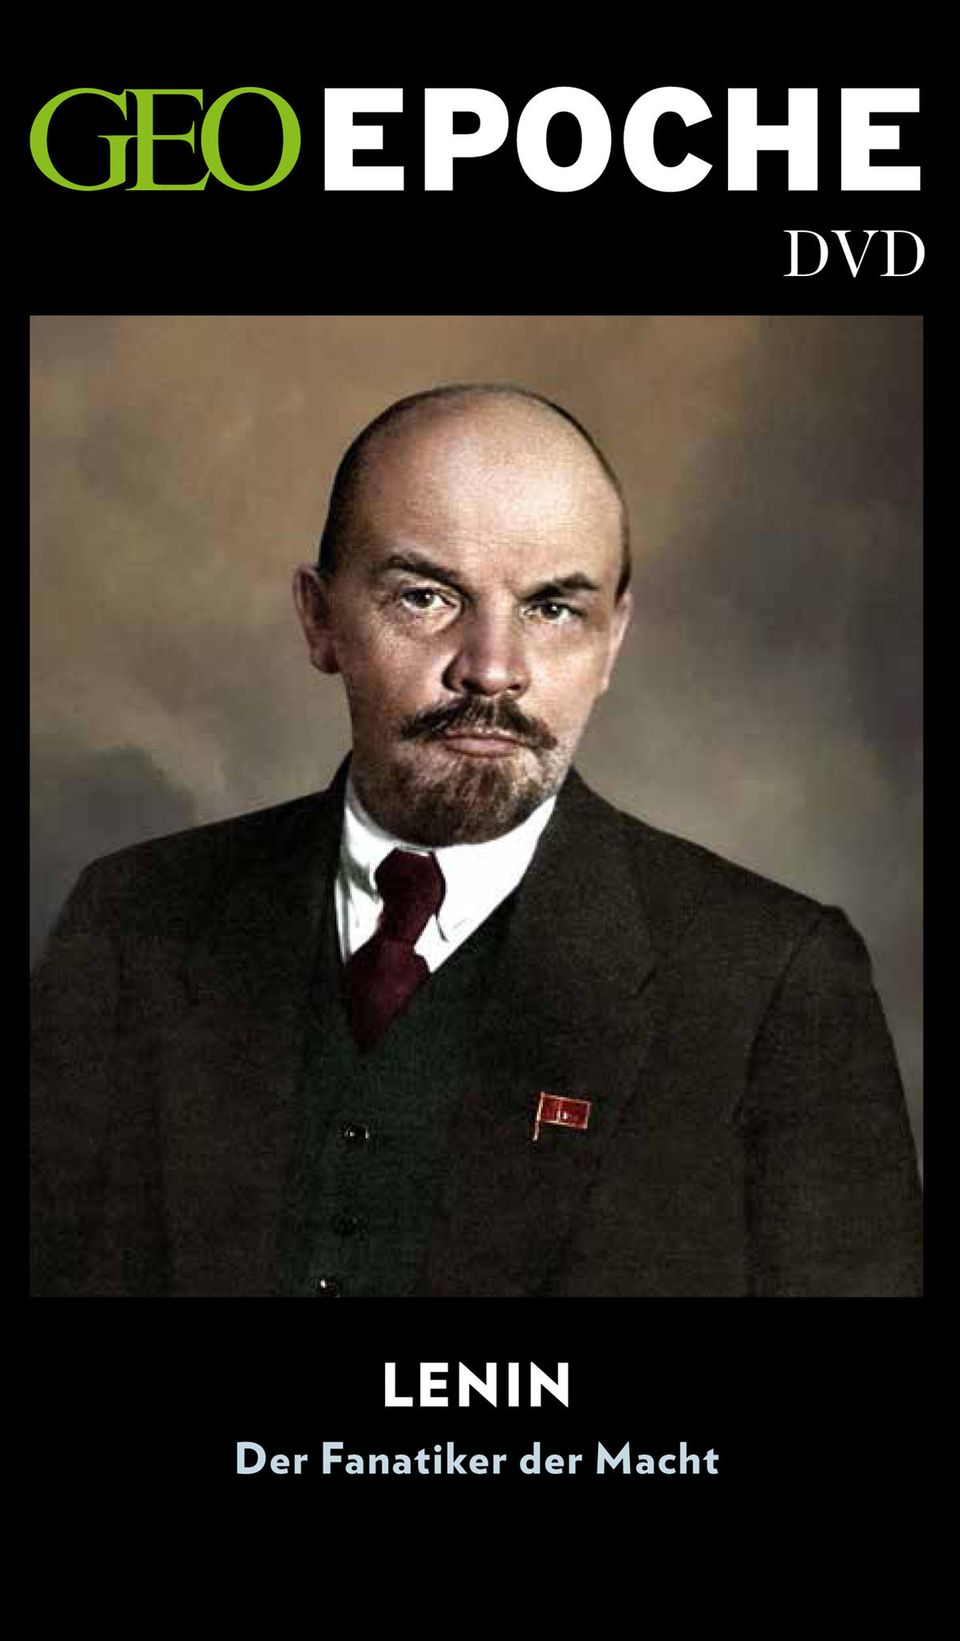 GEO EPOCHE, DVD, Lenin